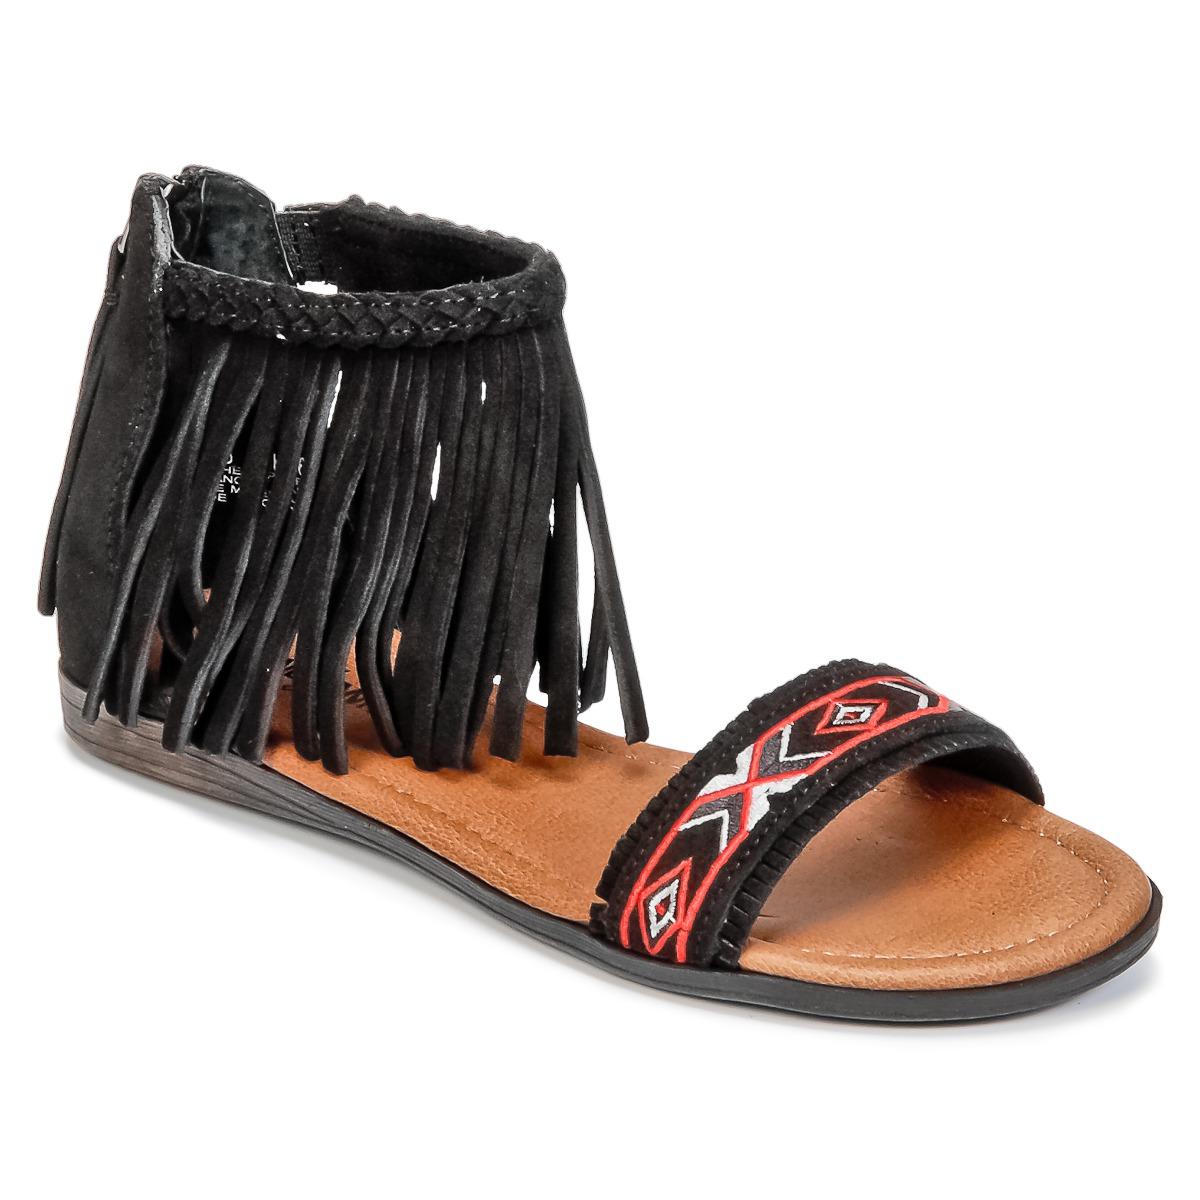 Minnetonka MOROCCO Schwarz - Kostenloser Versand bei Spartoode ! - Schuhe Sandalen / Sandaletten Damen 56,99 €